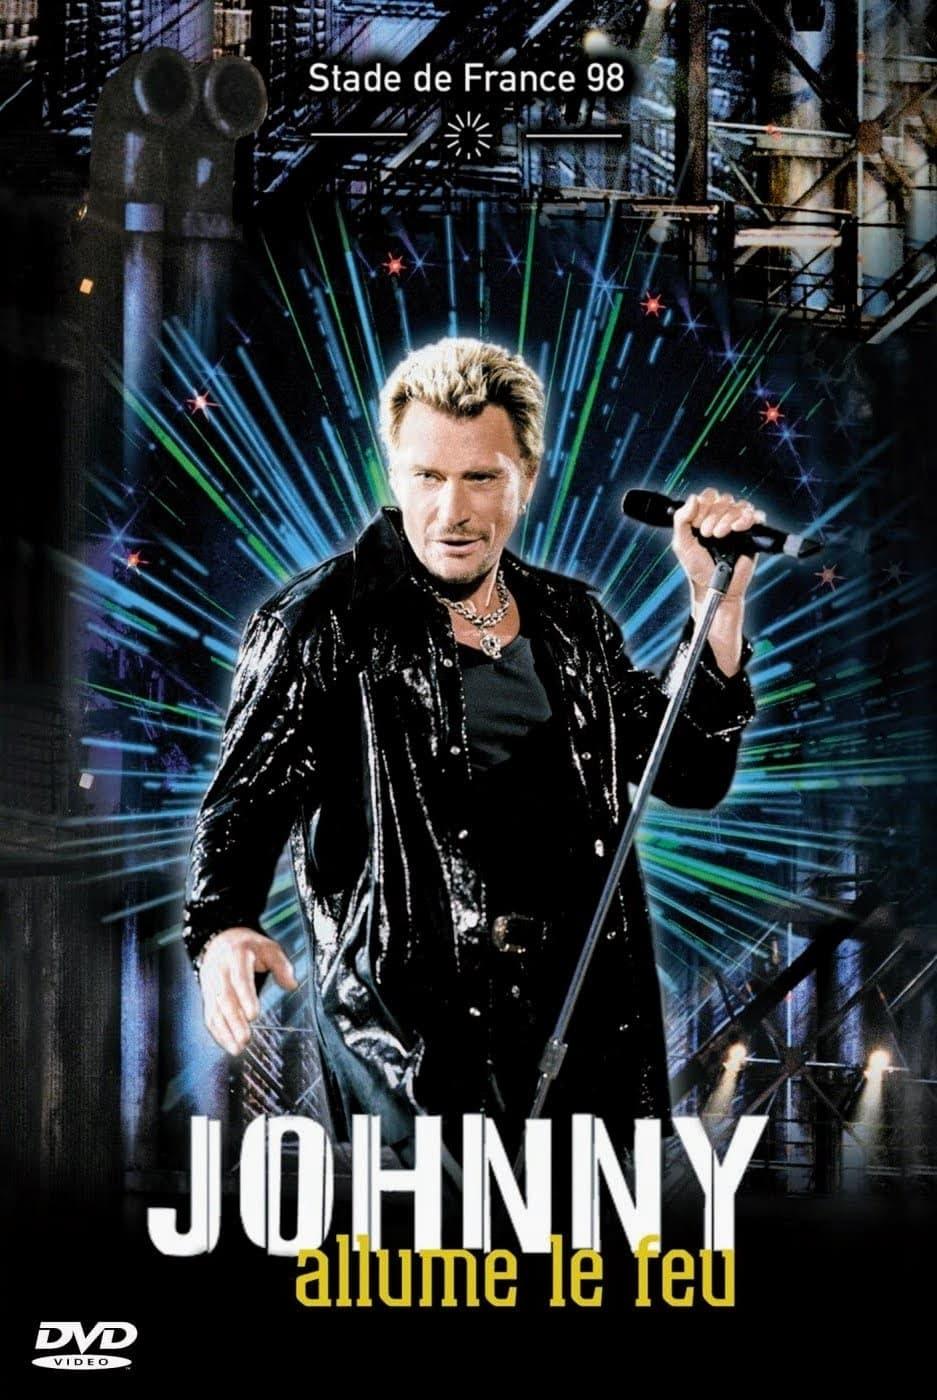 Johnny Hallyday - Allume le Feu (Stade de France 1998)